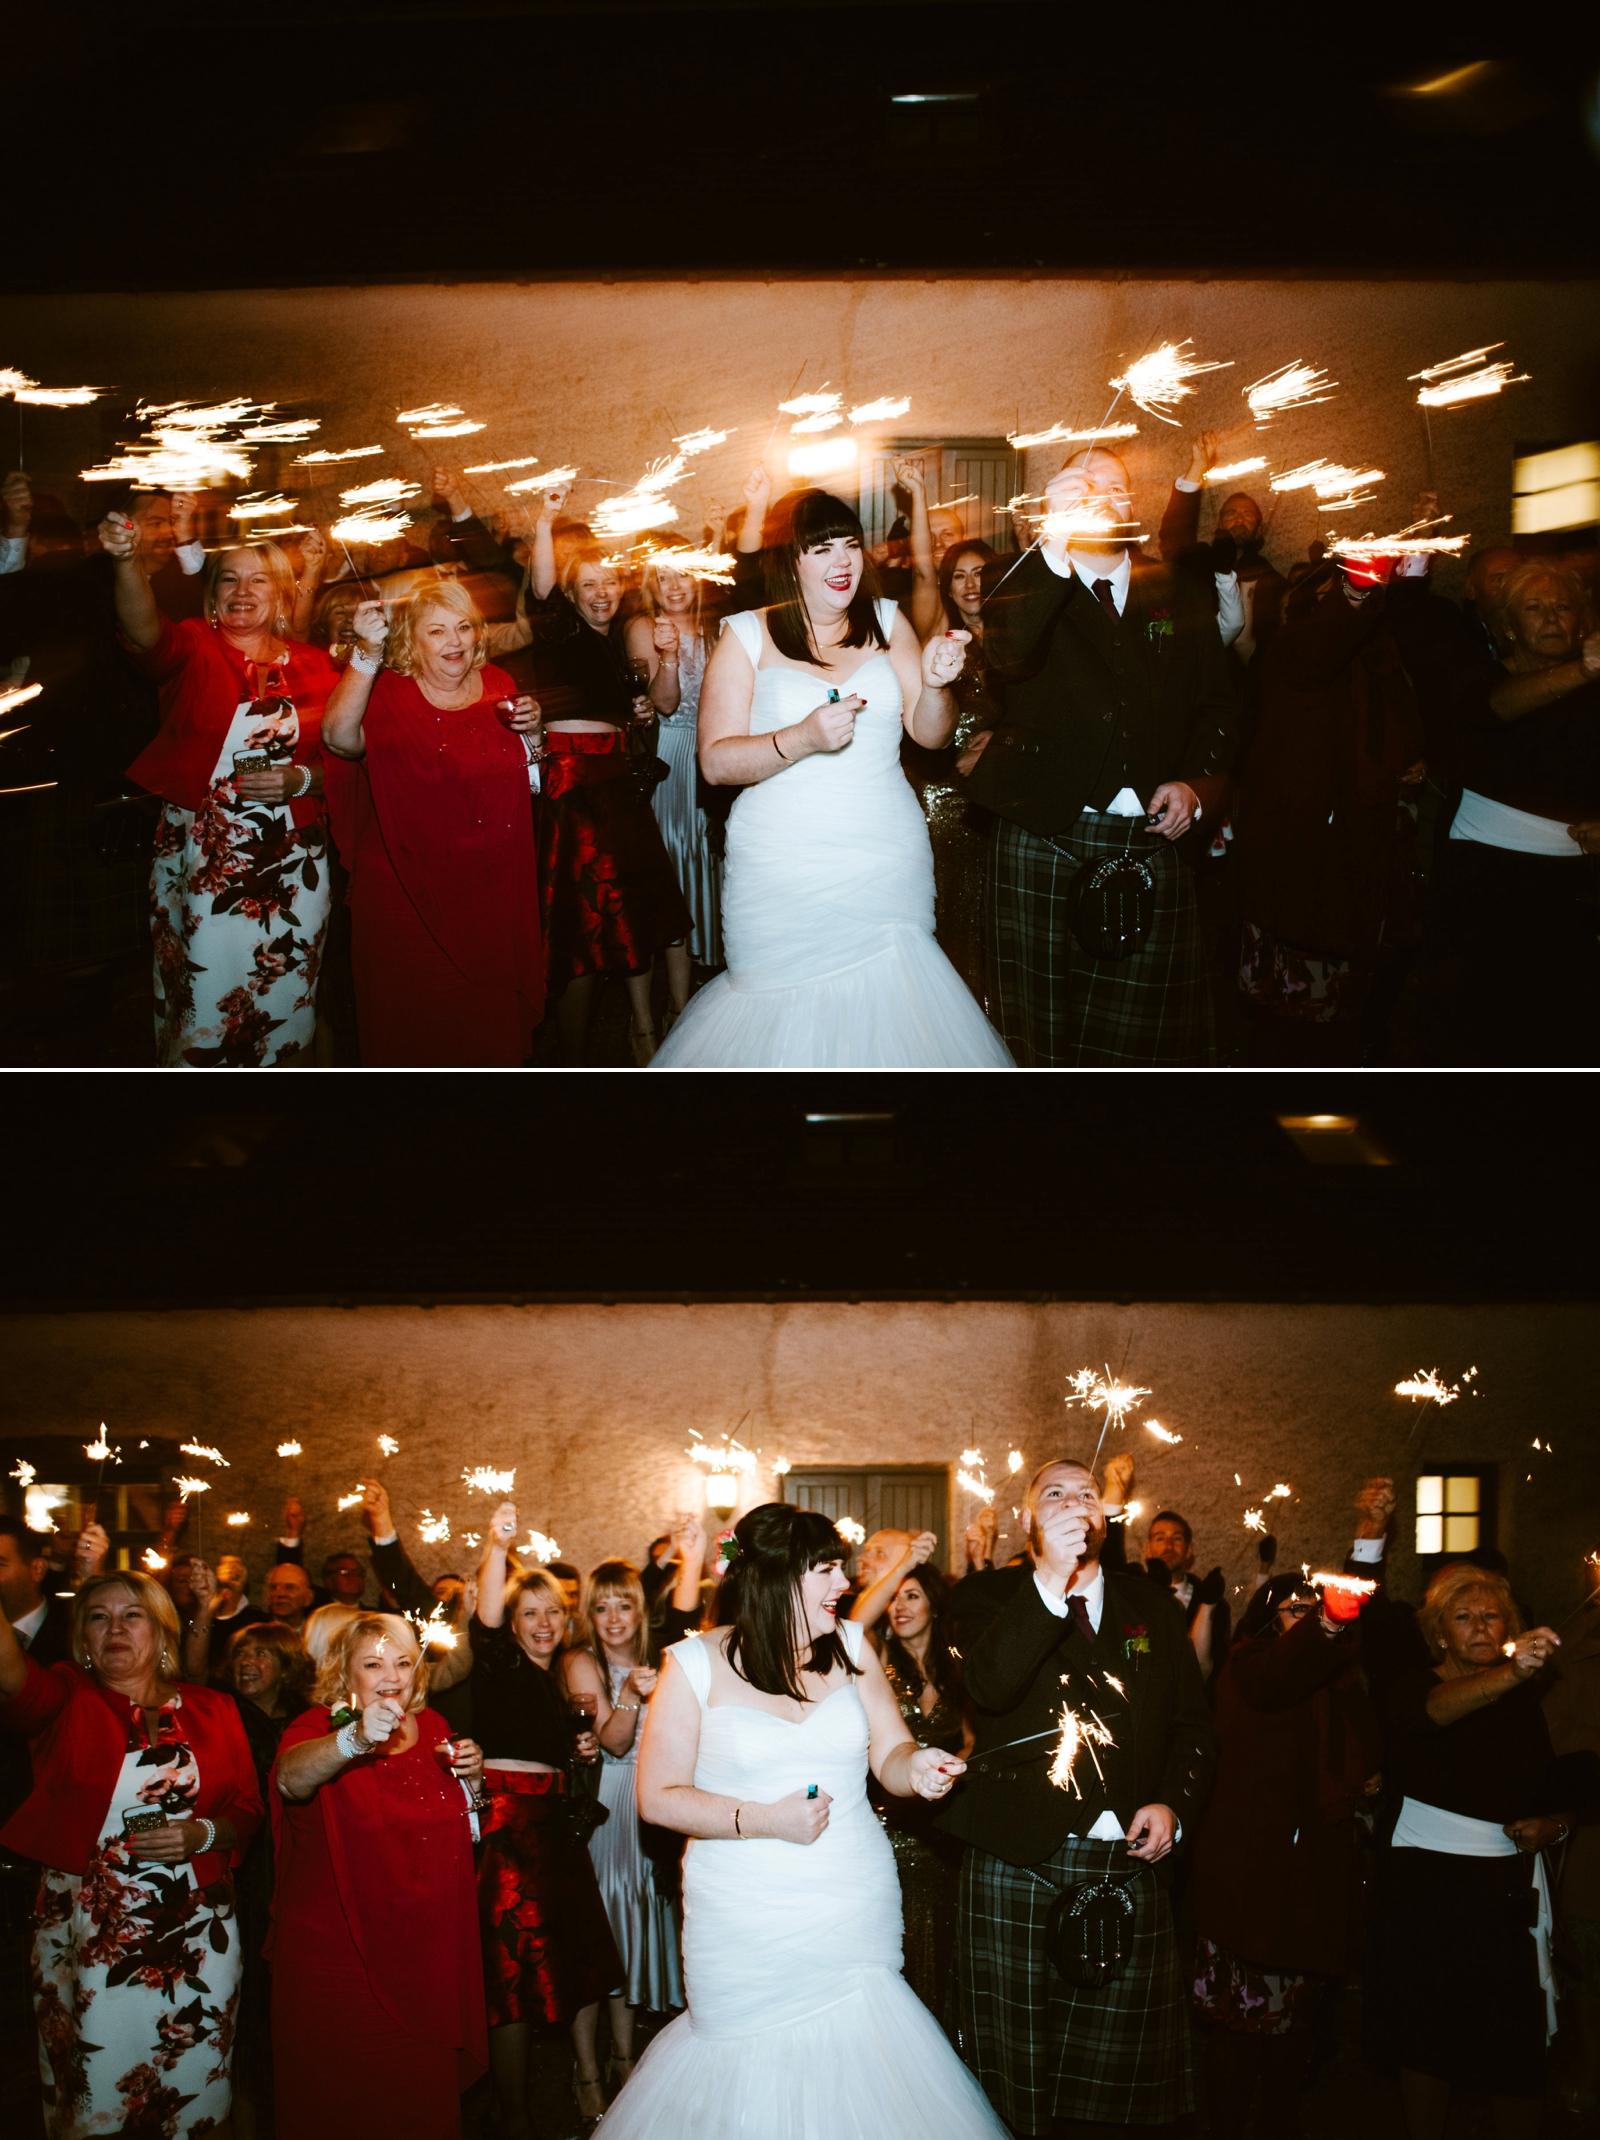 alternative-wedding-photography-scotland-katie-stephen-aikwood-tower-466.jpg